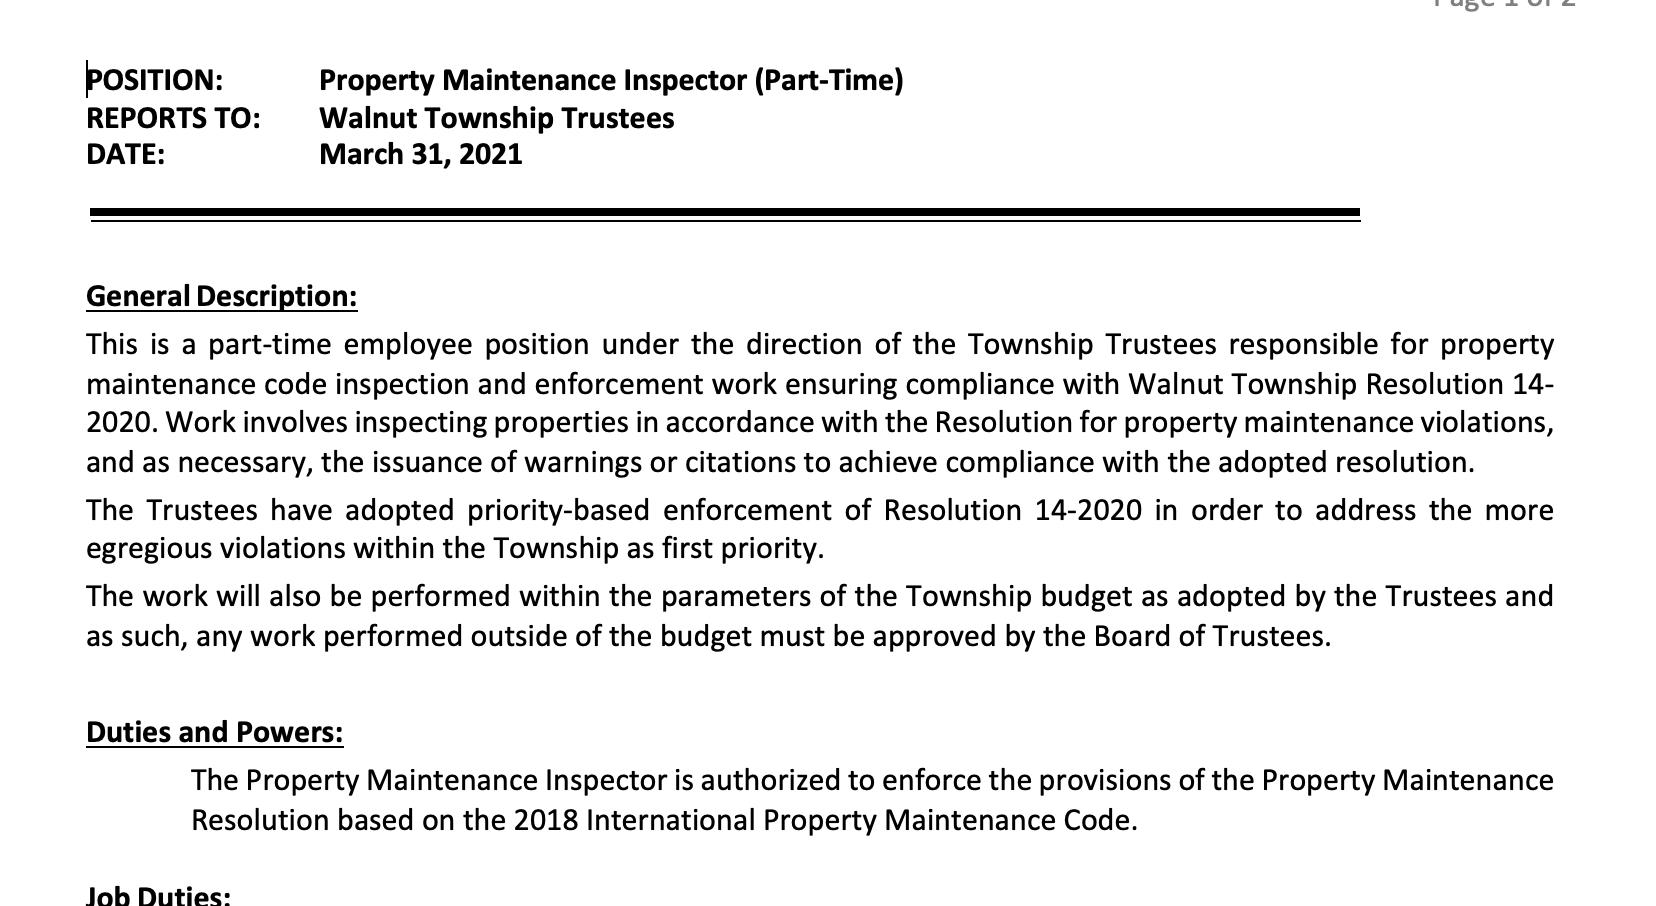 Property Maintenance Inspector (Part-Time)